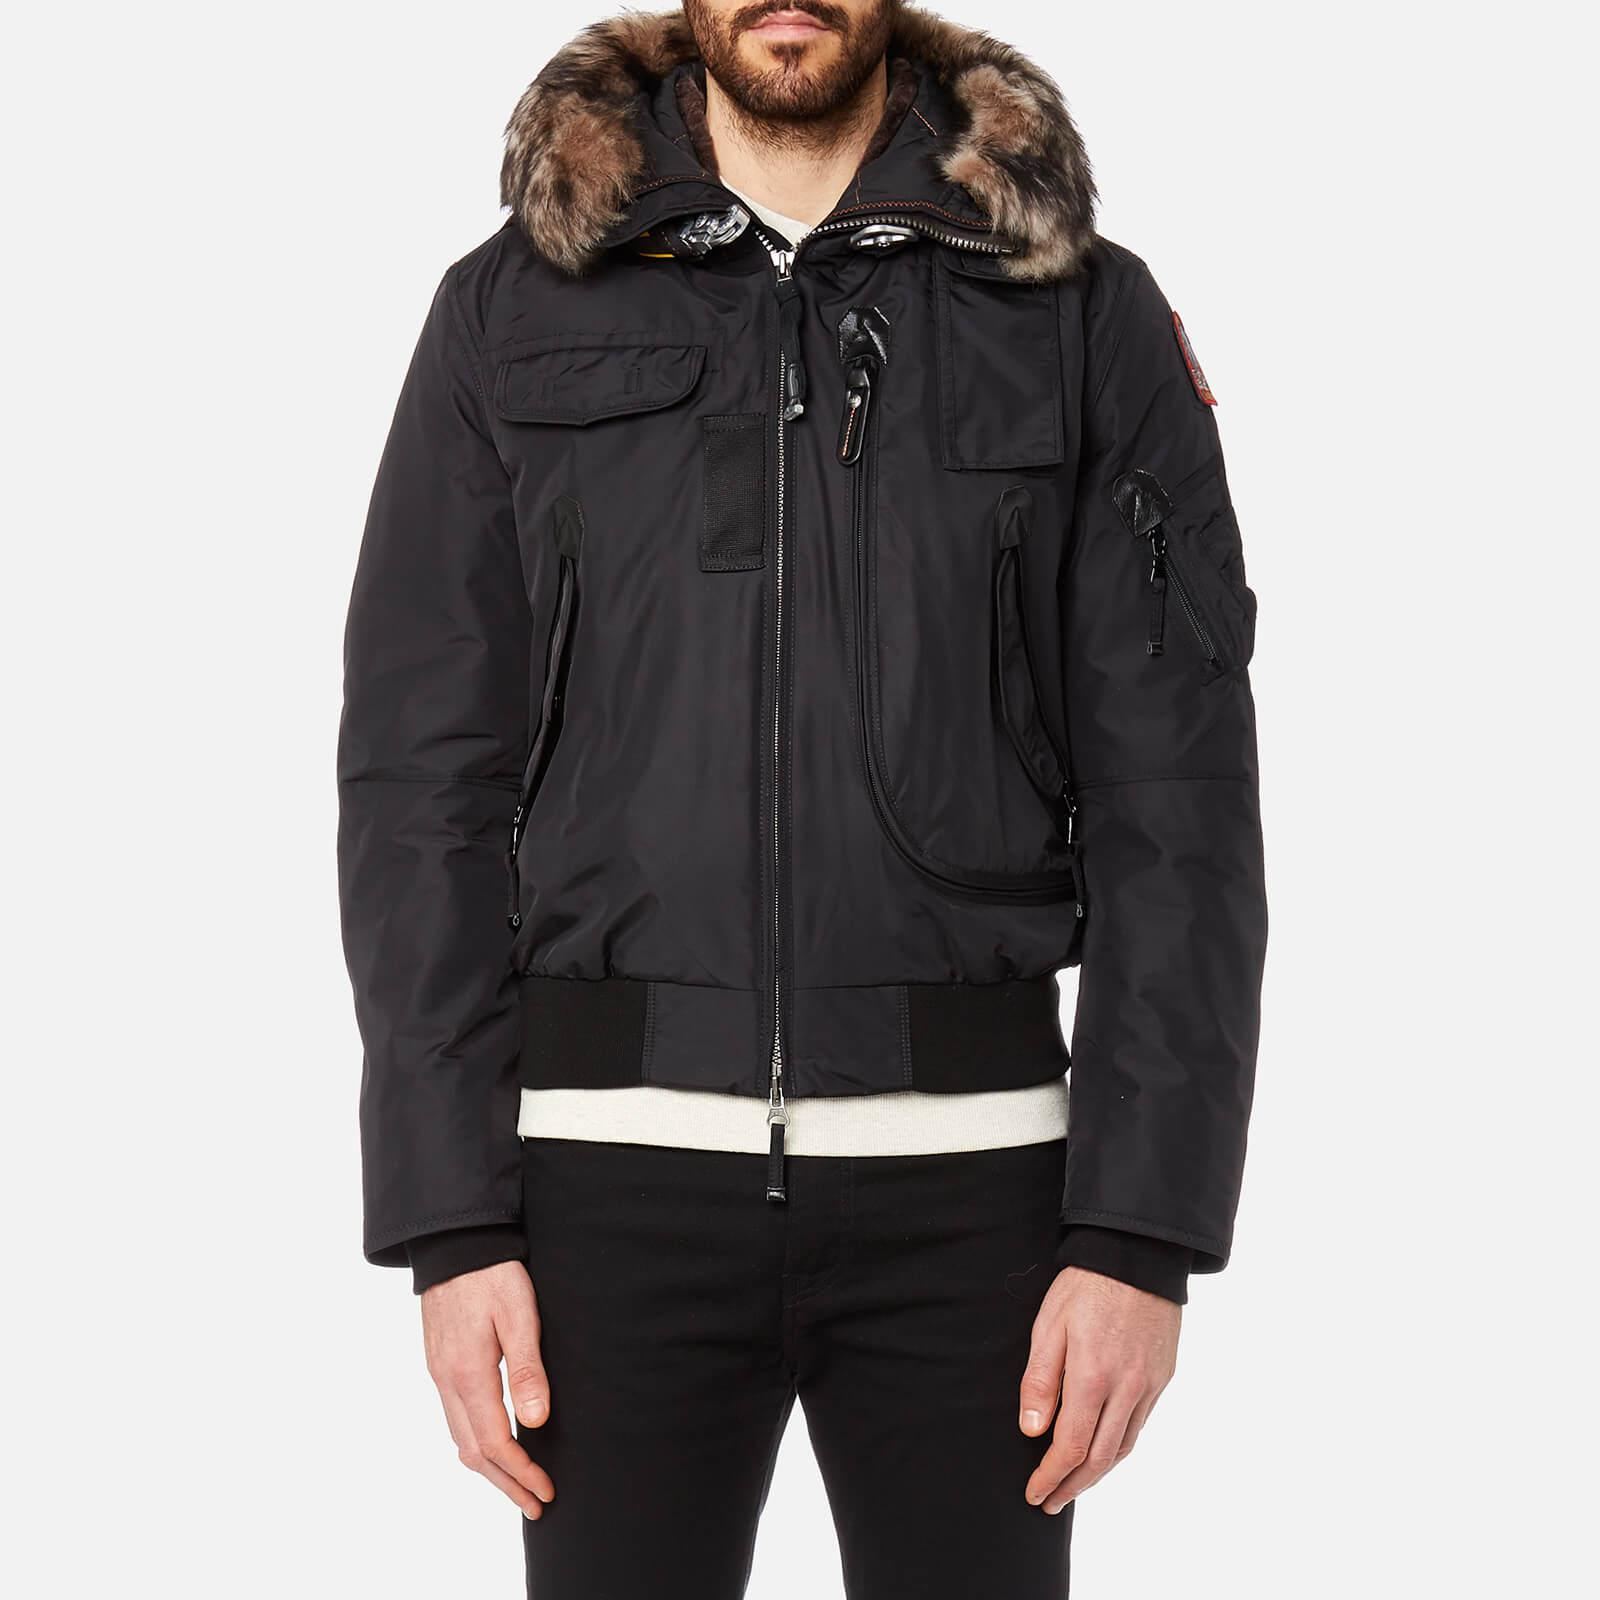 Parajumpers. Men's Black Gobi Faux Fur Bomber Jacket